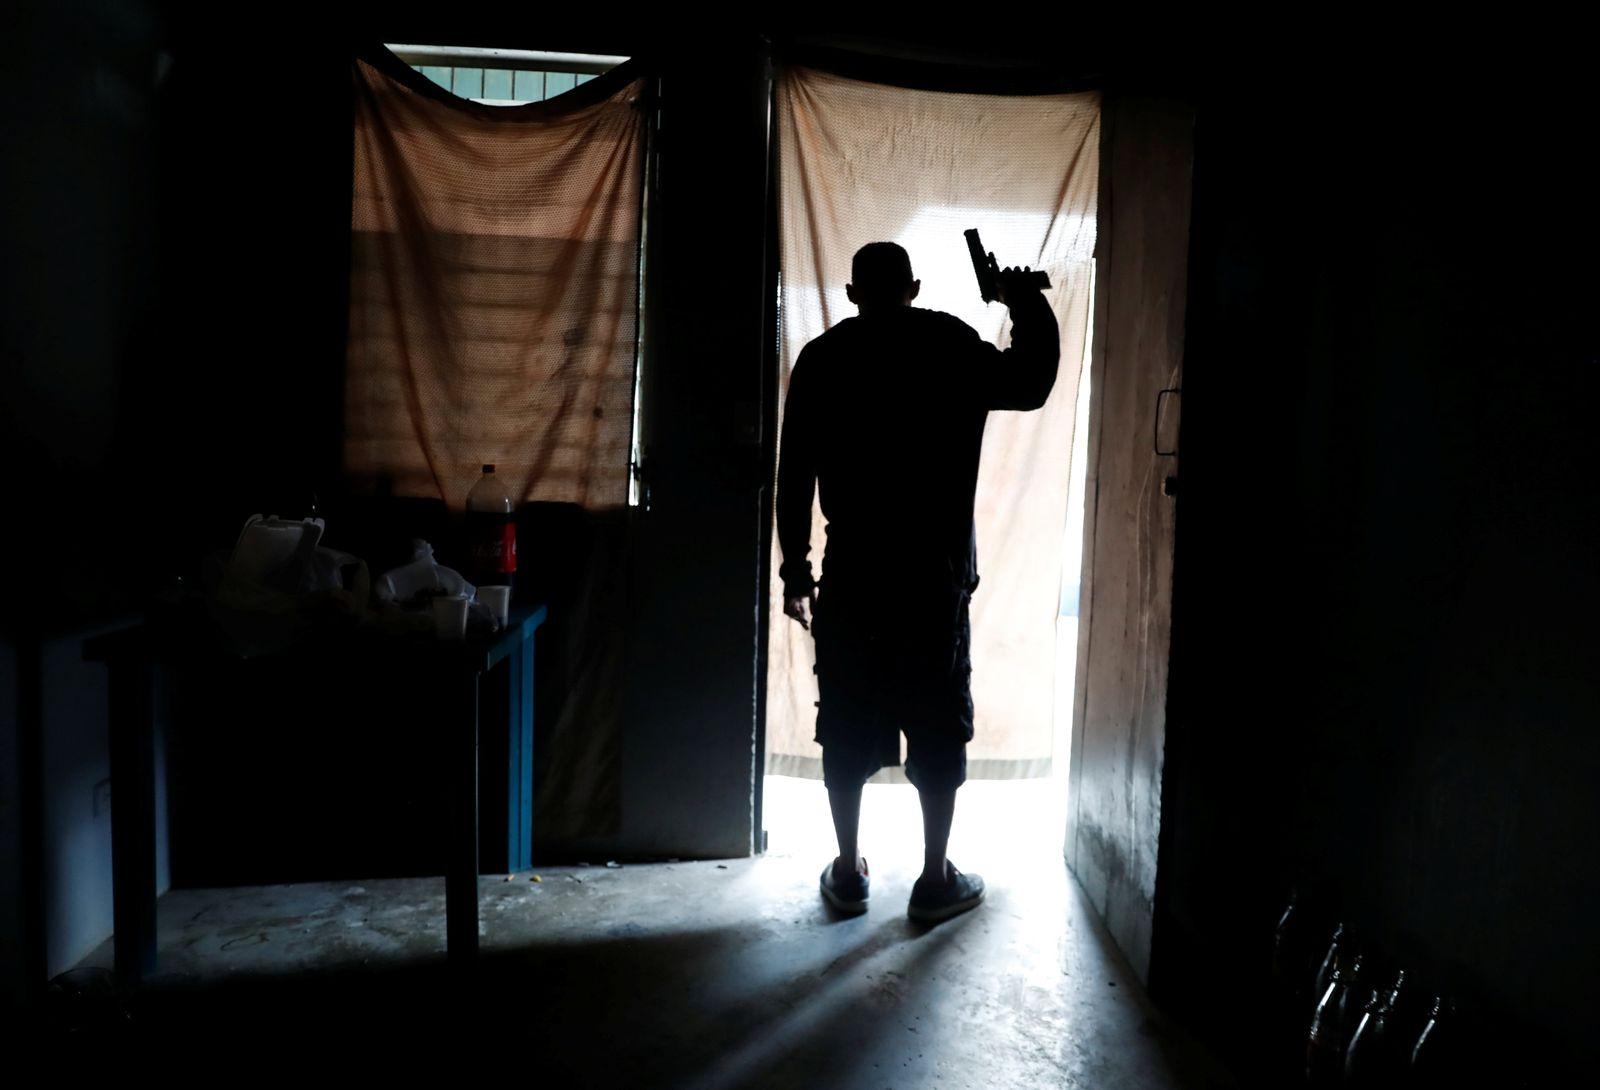 HONDURAS-VIOLENCE/